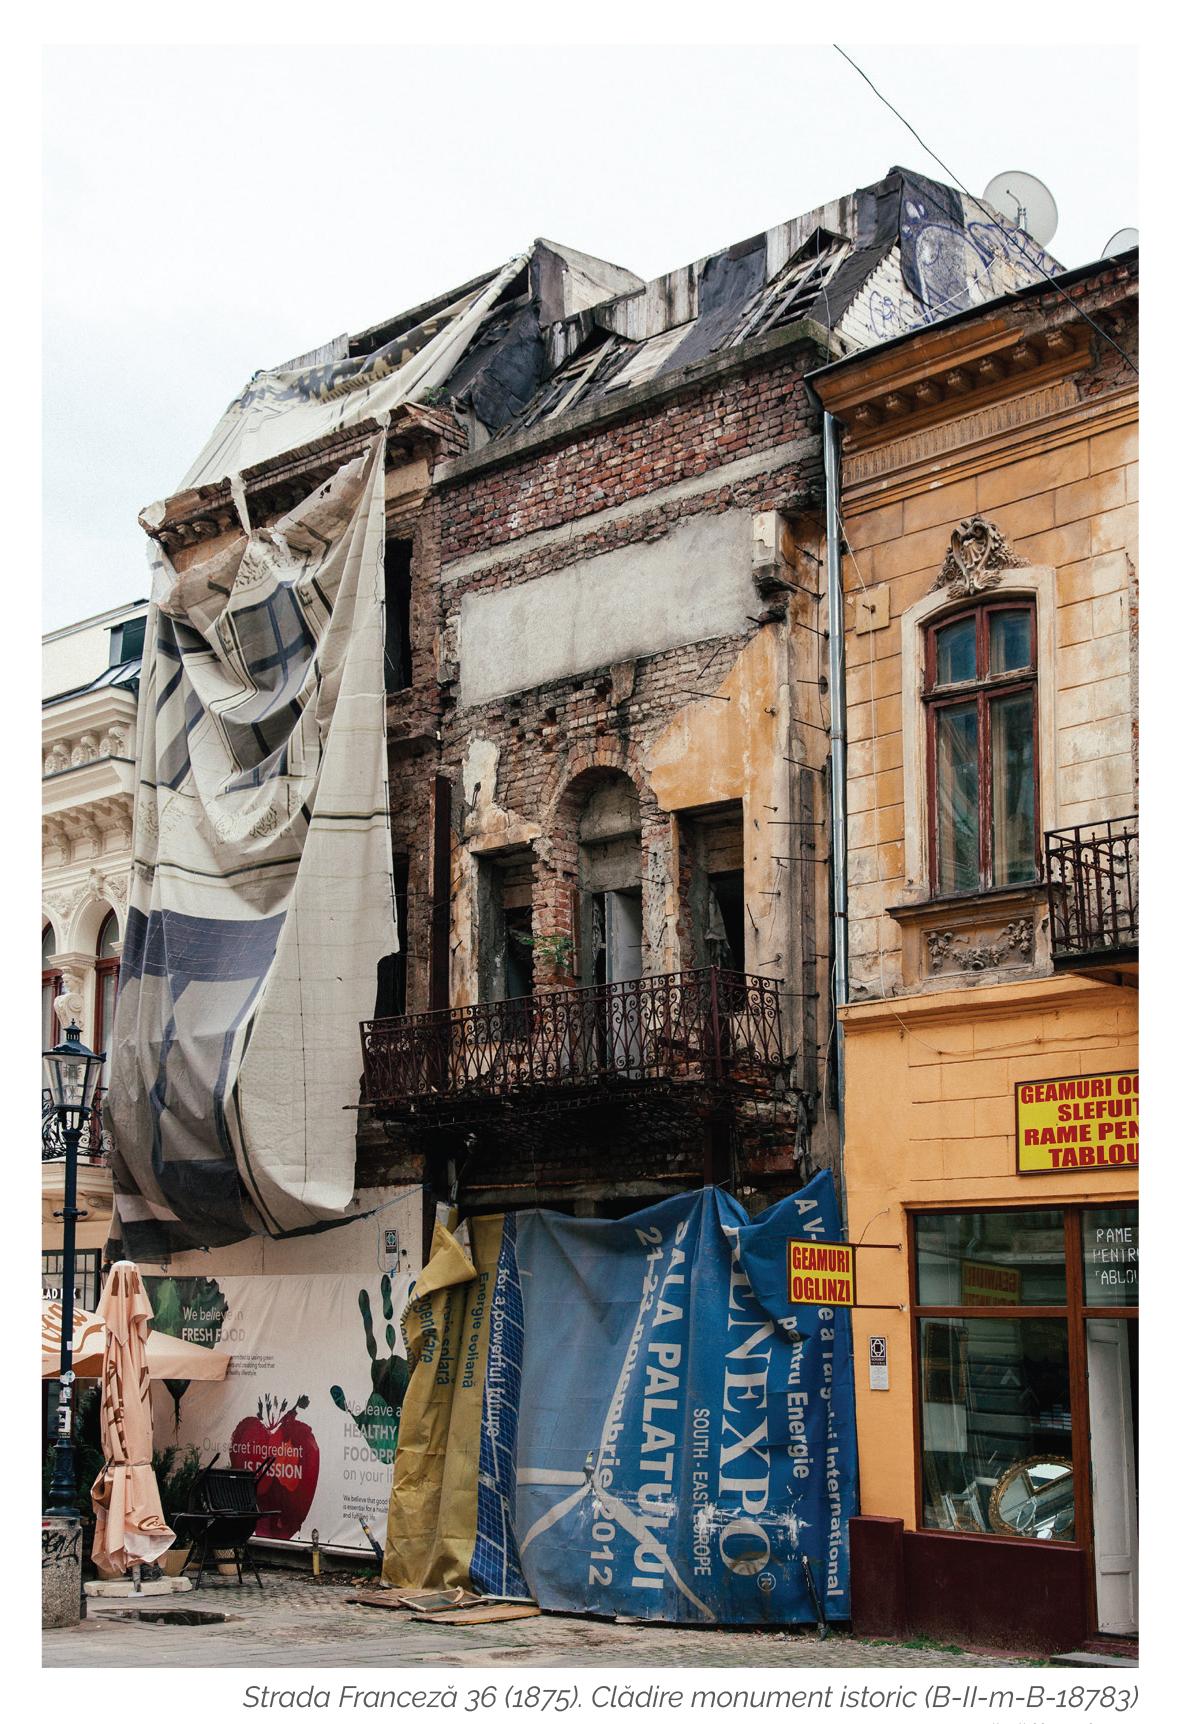 Irina Caretu_Bucuresti. Orasul vulnerabil_risc seismic_Bucuresti_Str. Franceza